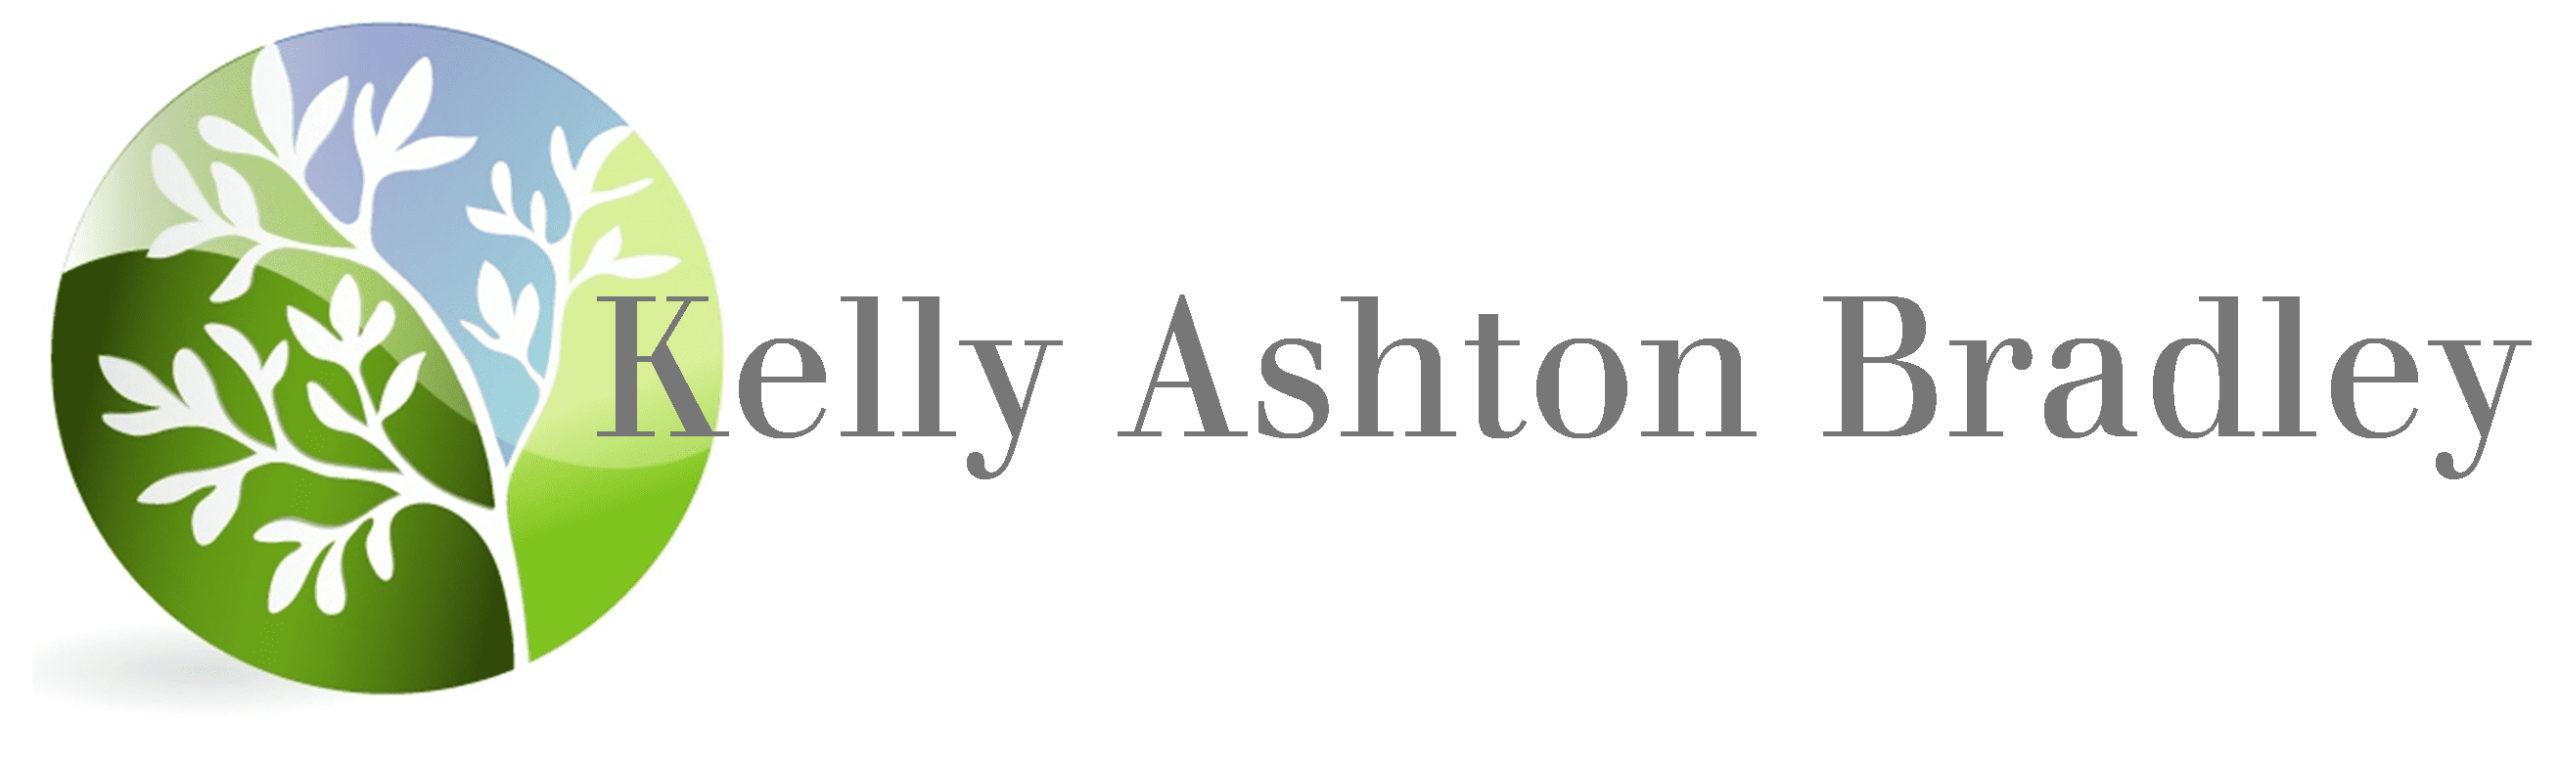 Digital Marketing Director, Kelly Ashton Bradley